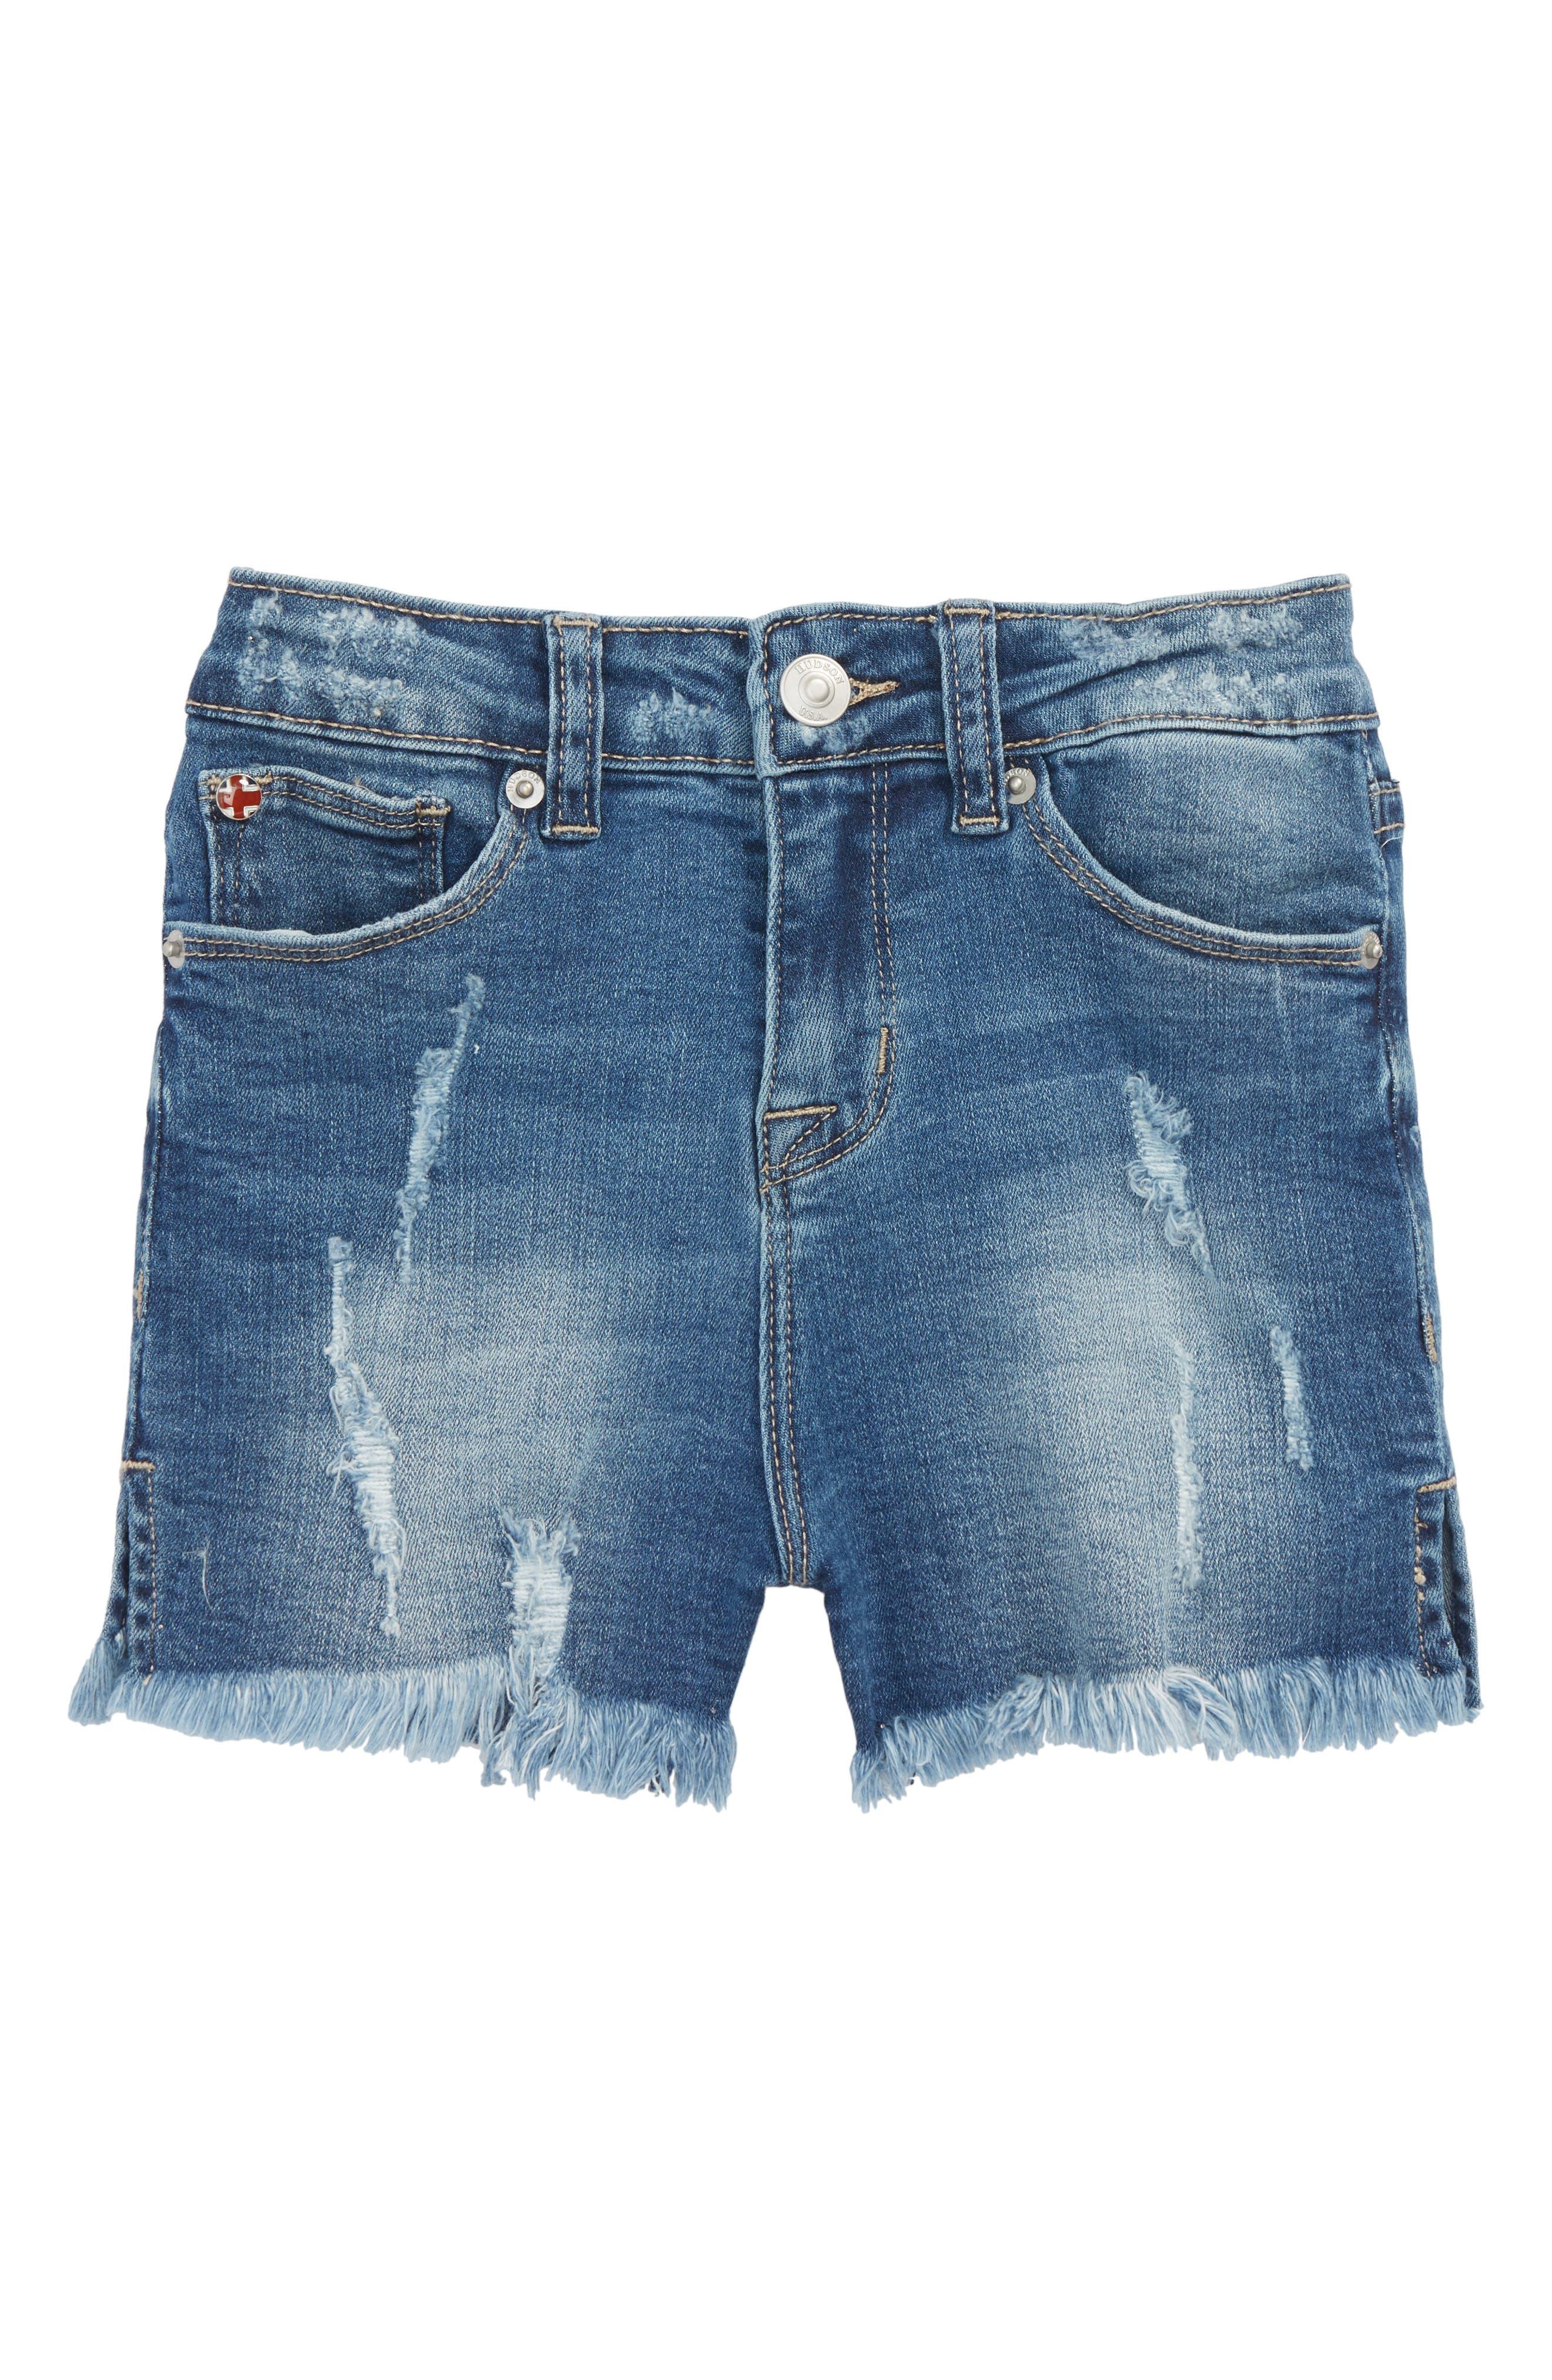 Lily High Waist Cutoff Denim Shorts,                         Main,                         color, Iom-Indigo Mix